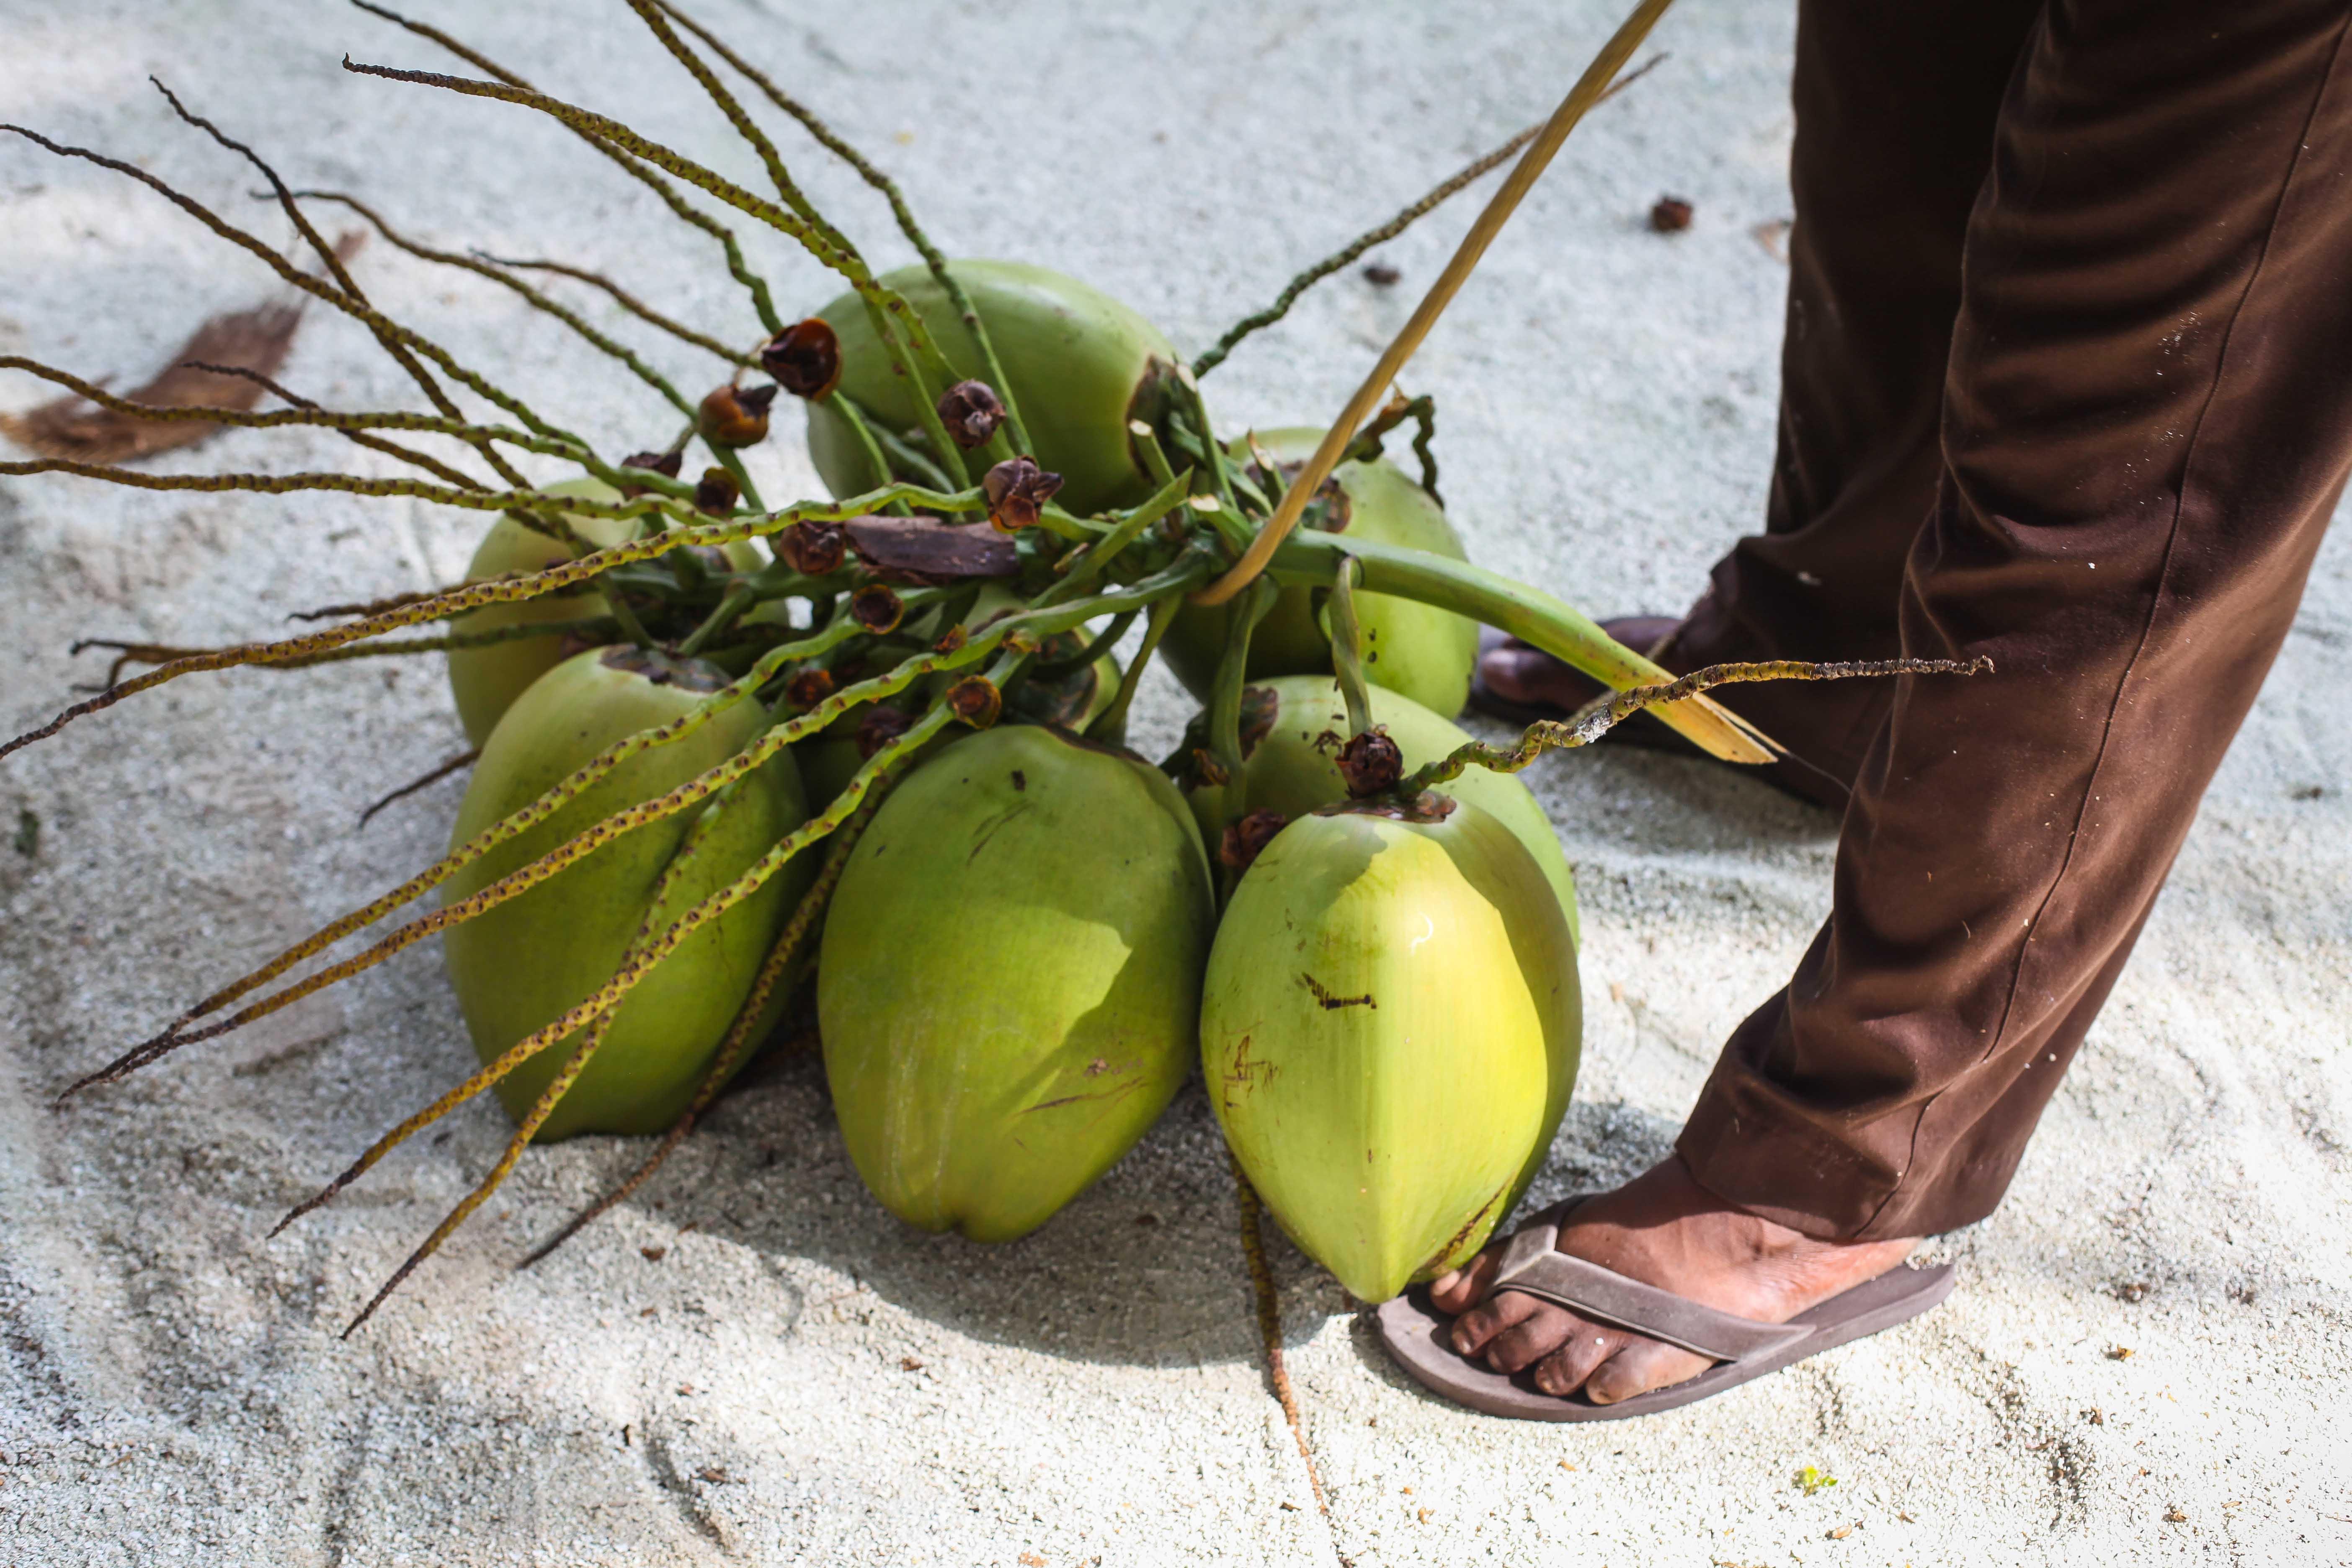 Condor Cocos Cookies Maafushivaru Zuckerzimtundliebe Malediven Trauminsel-21